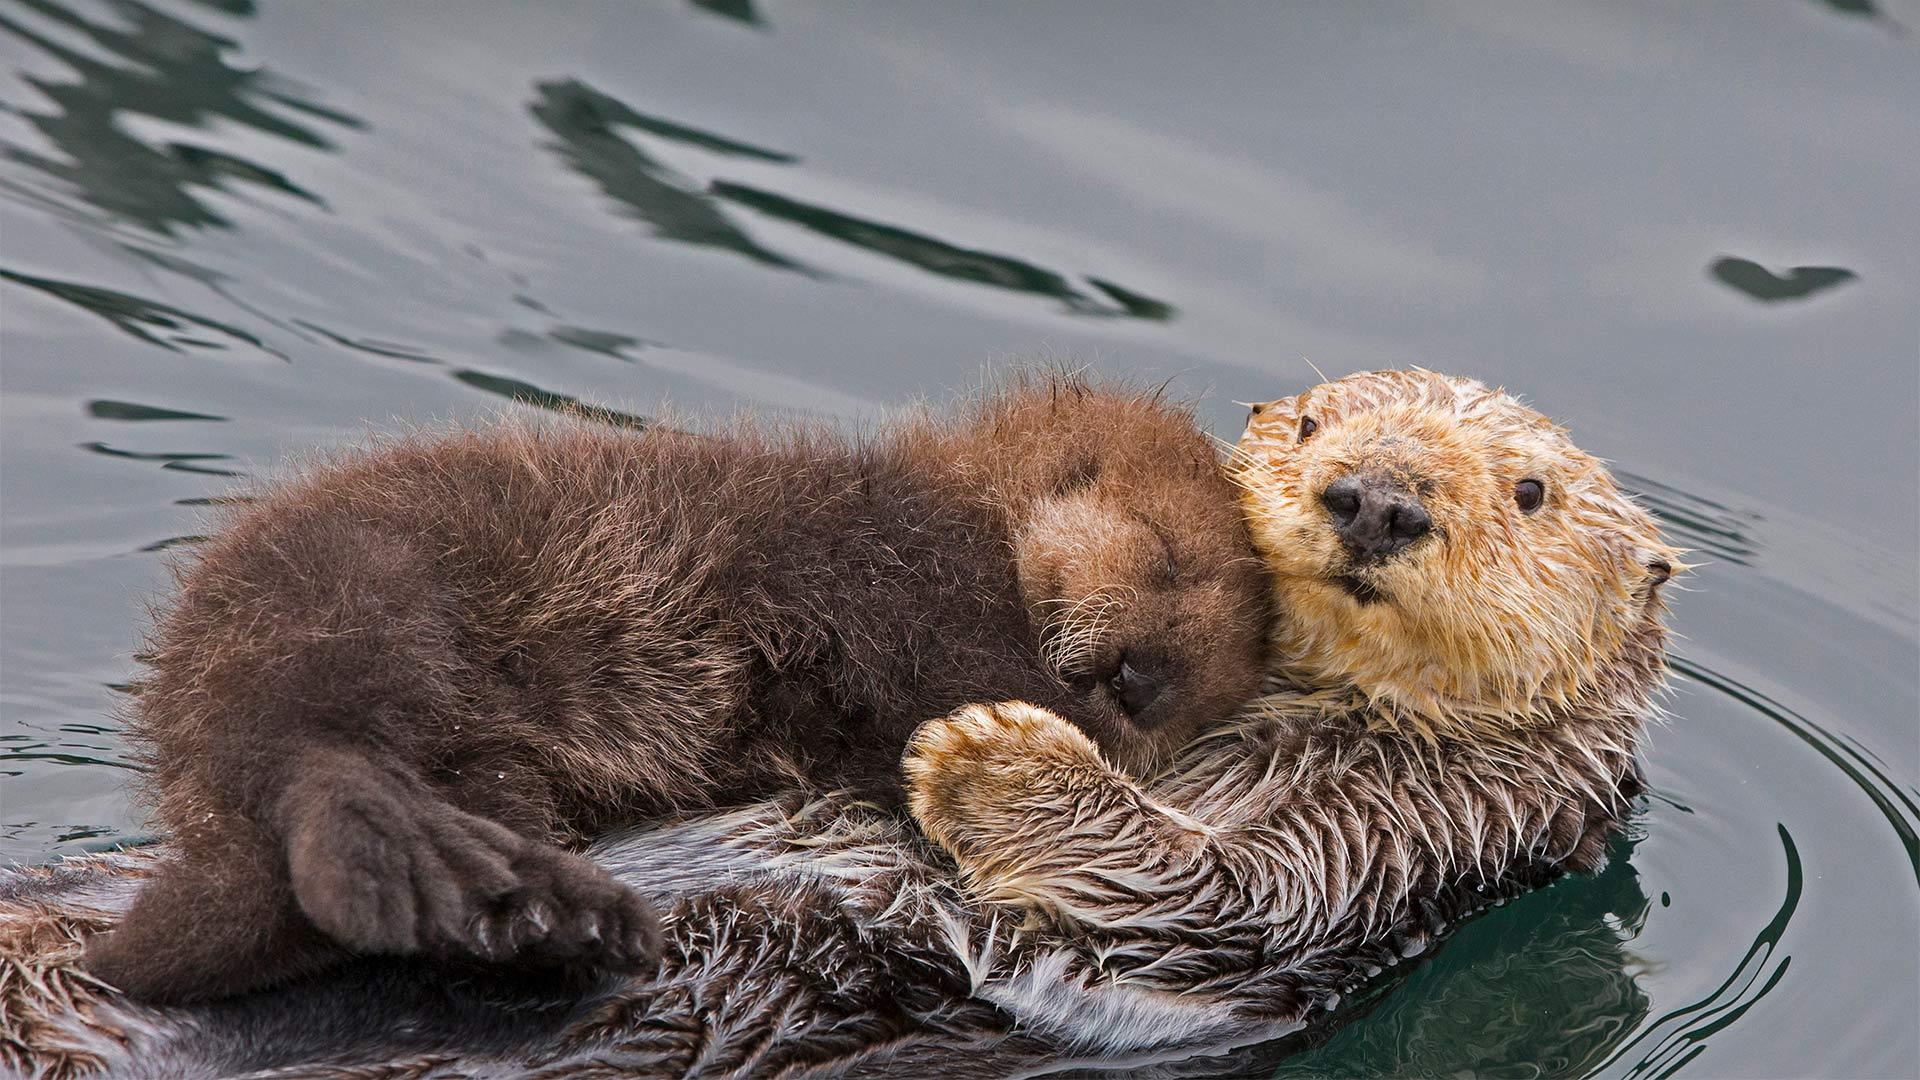 Sea otter mother and newborn pup, Monterey Bay, California (© Suzi Eszterhas/Minden Pictures)(Bing United States)